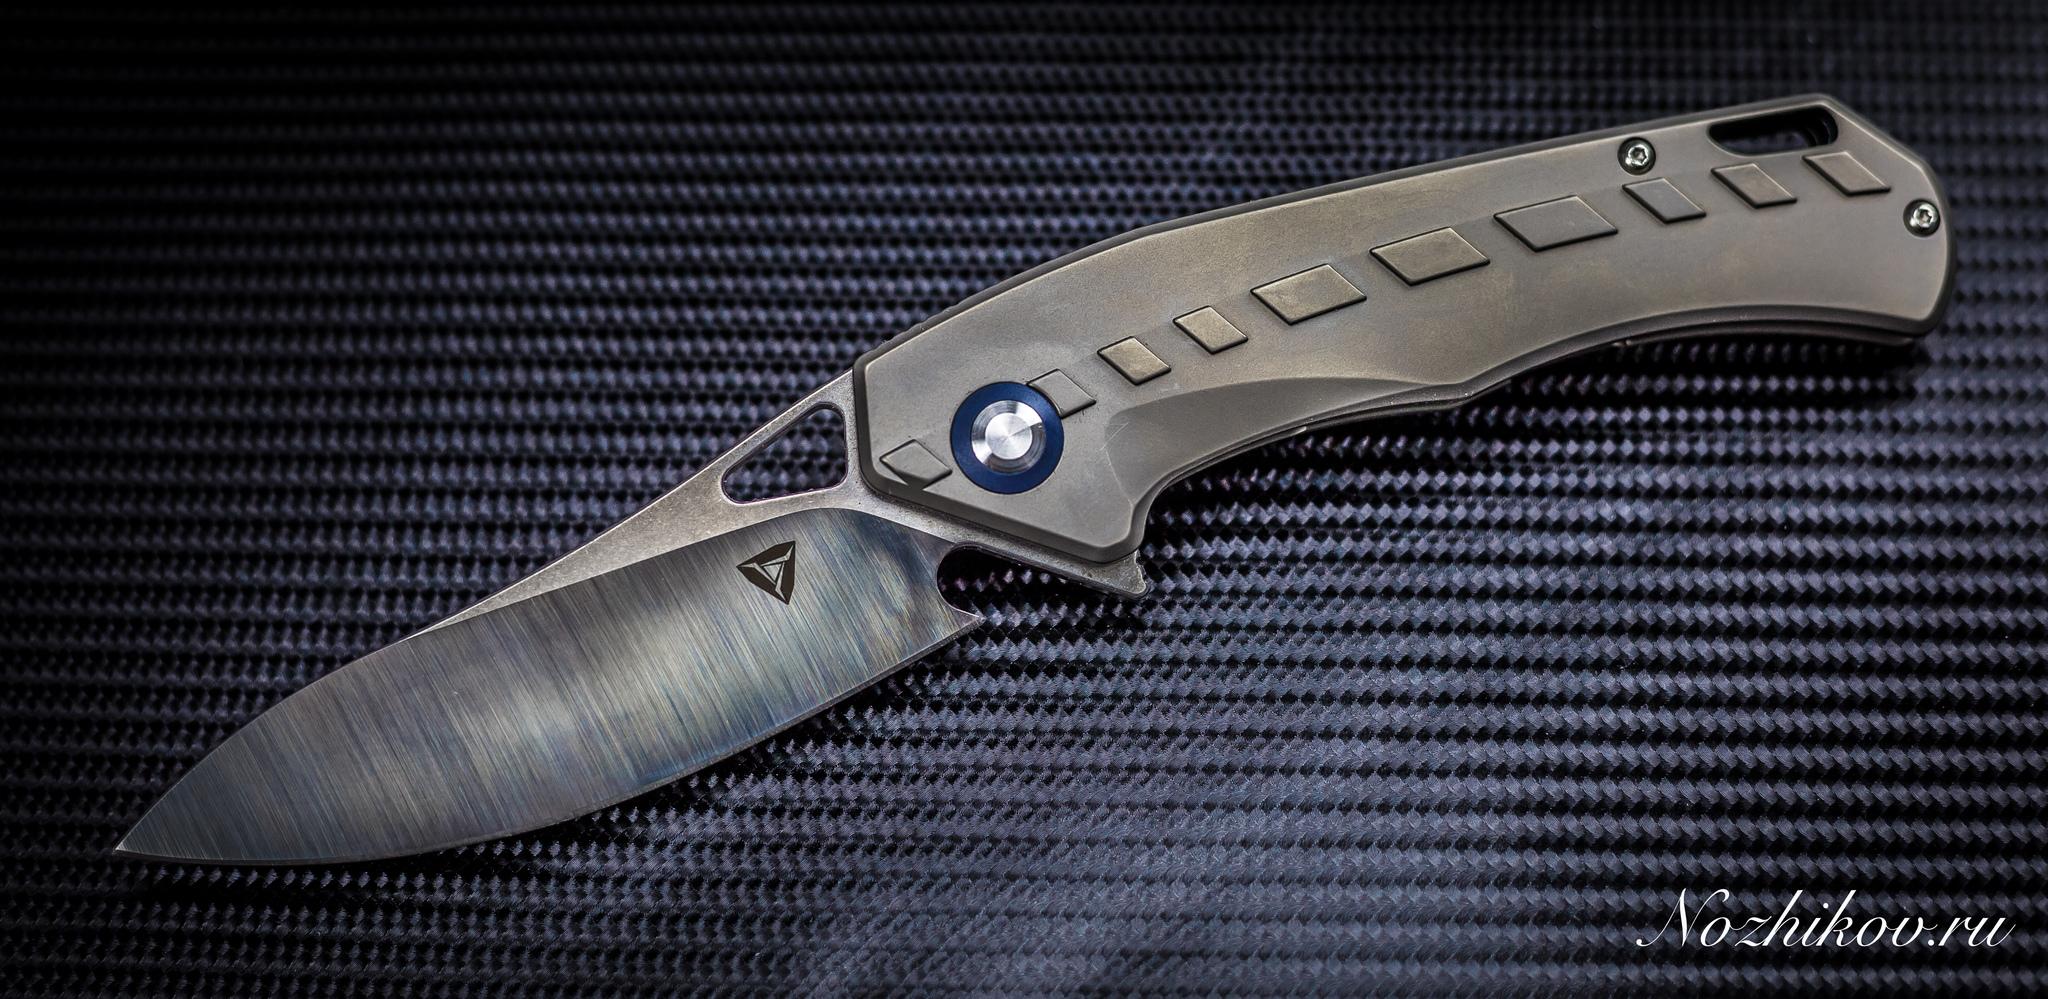 Складной нож Maker Spacer, сталь S35VN